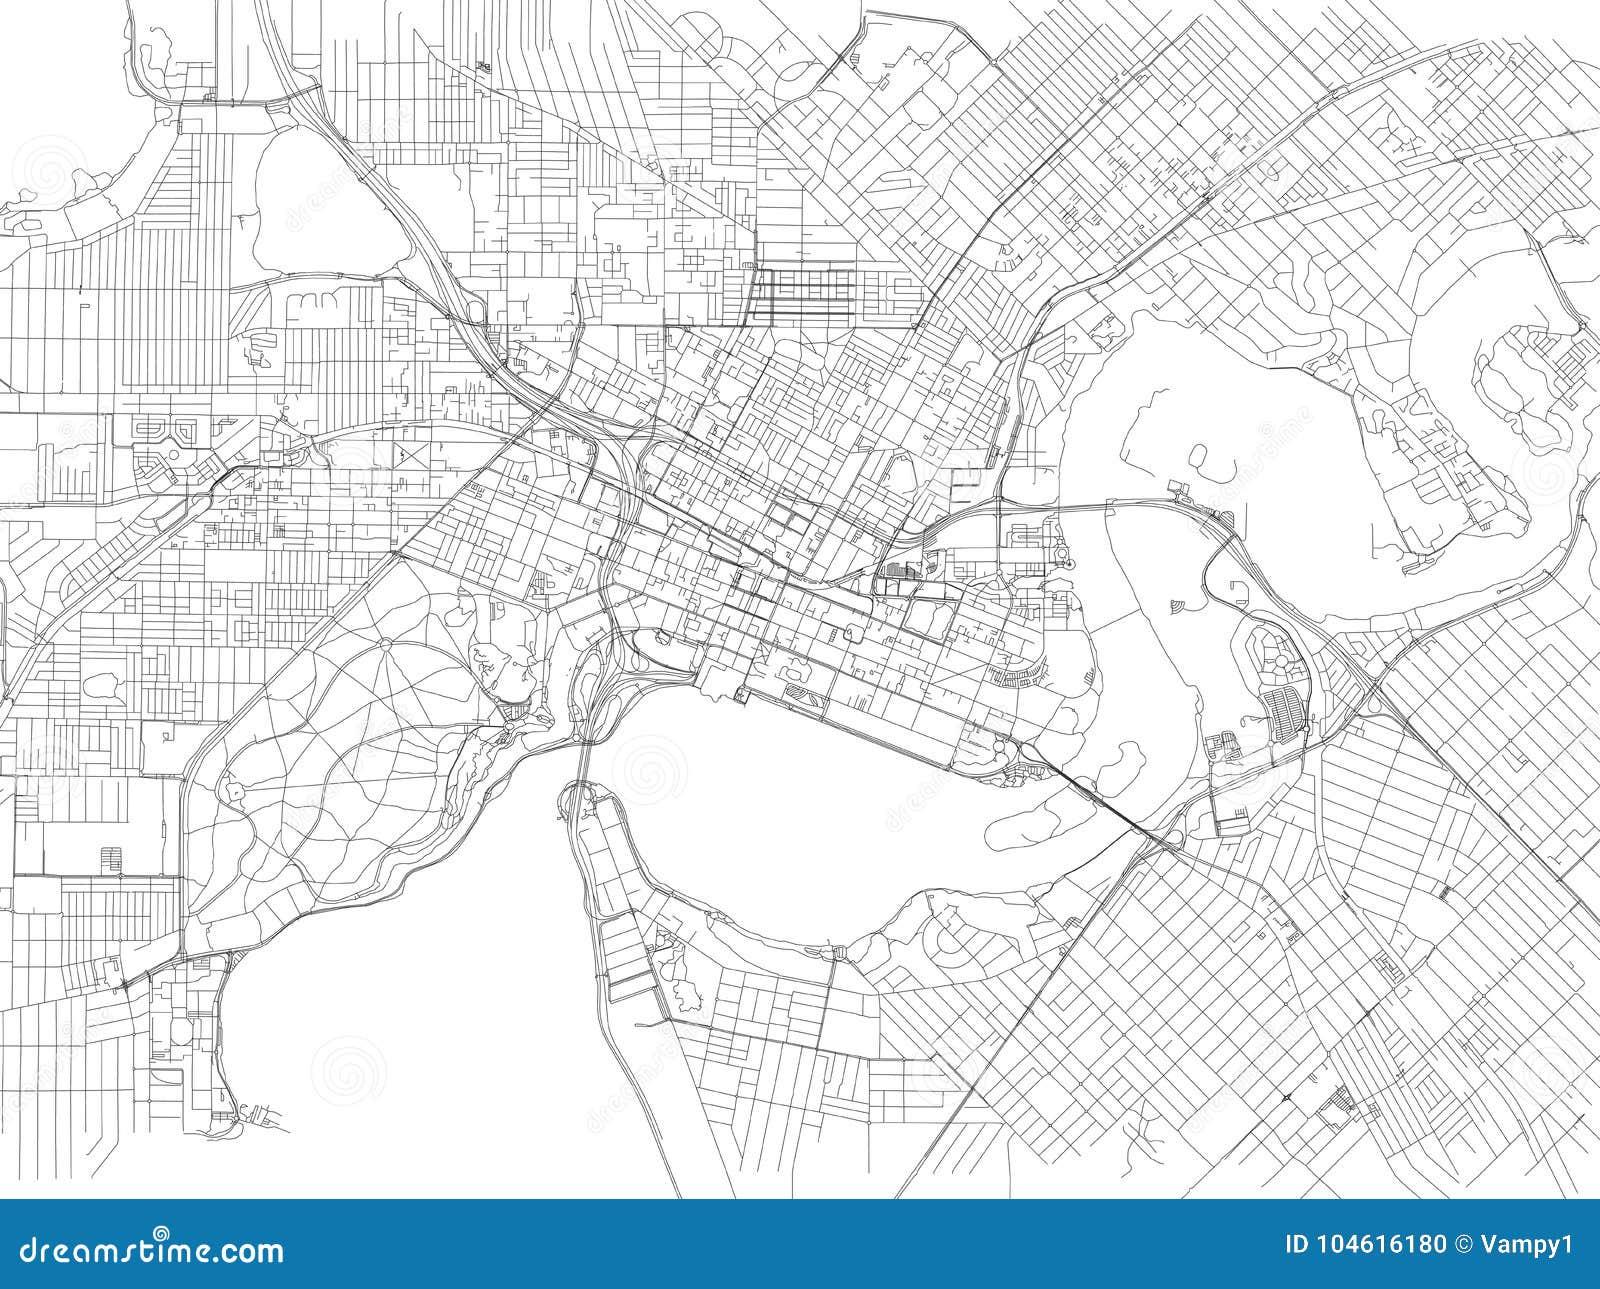 Street Map Australia.Streets Of Perth City Map Australia Stock Vector Illustration Of